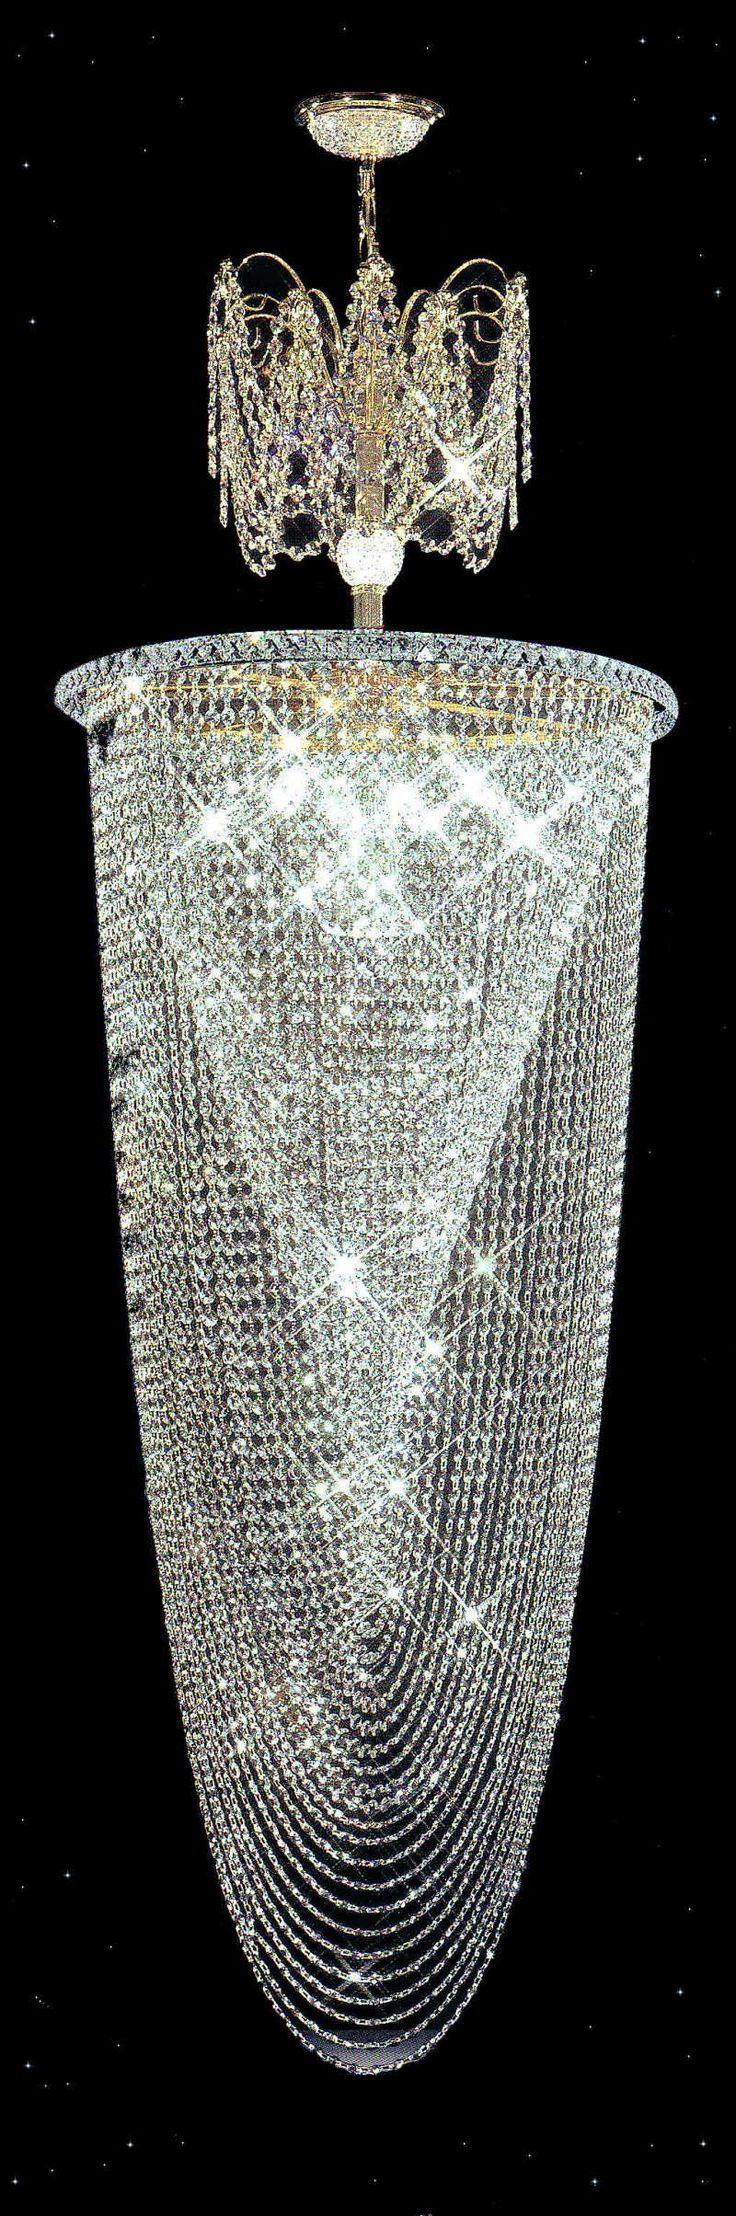 Frivolous Fabulous - Crystal Chandelier Frivolous Fabulous Diva